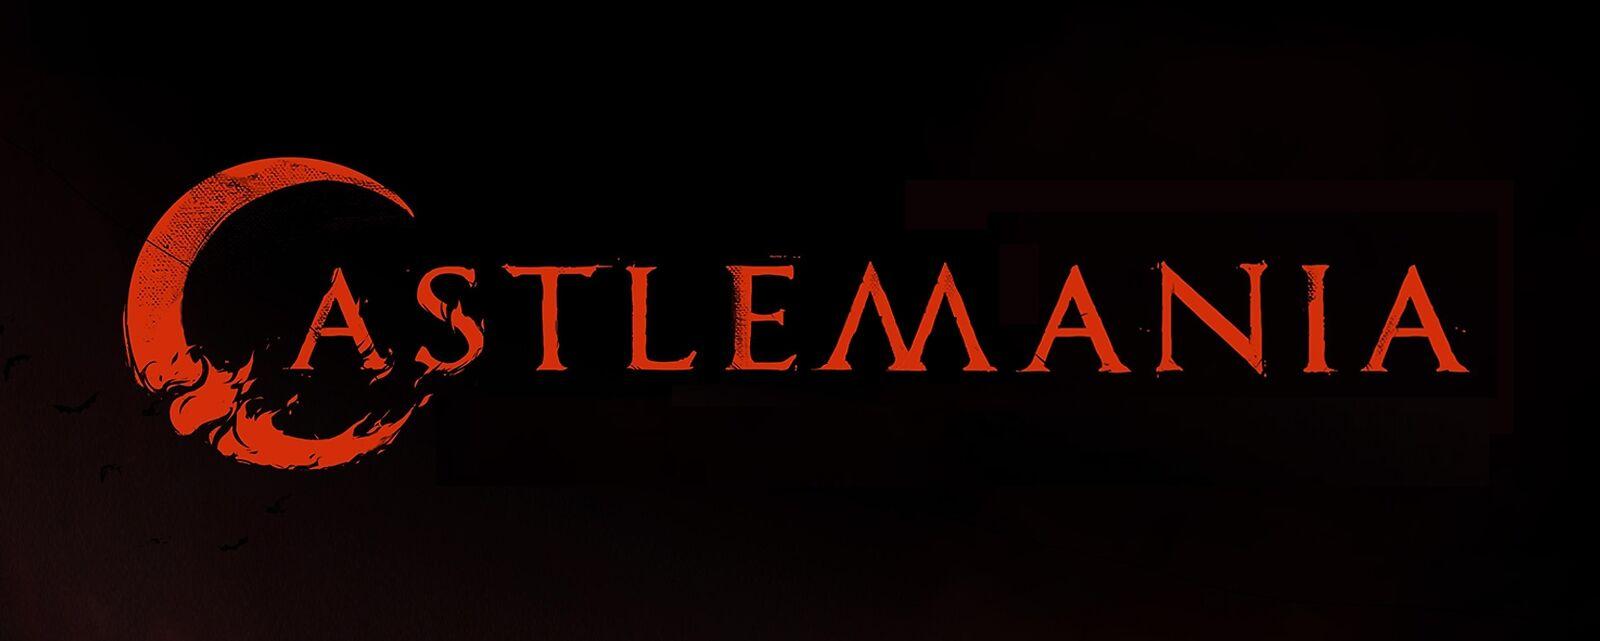 CastleMania Games